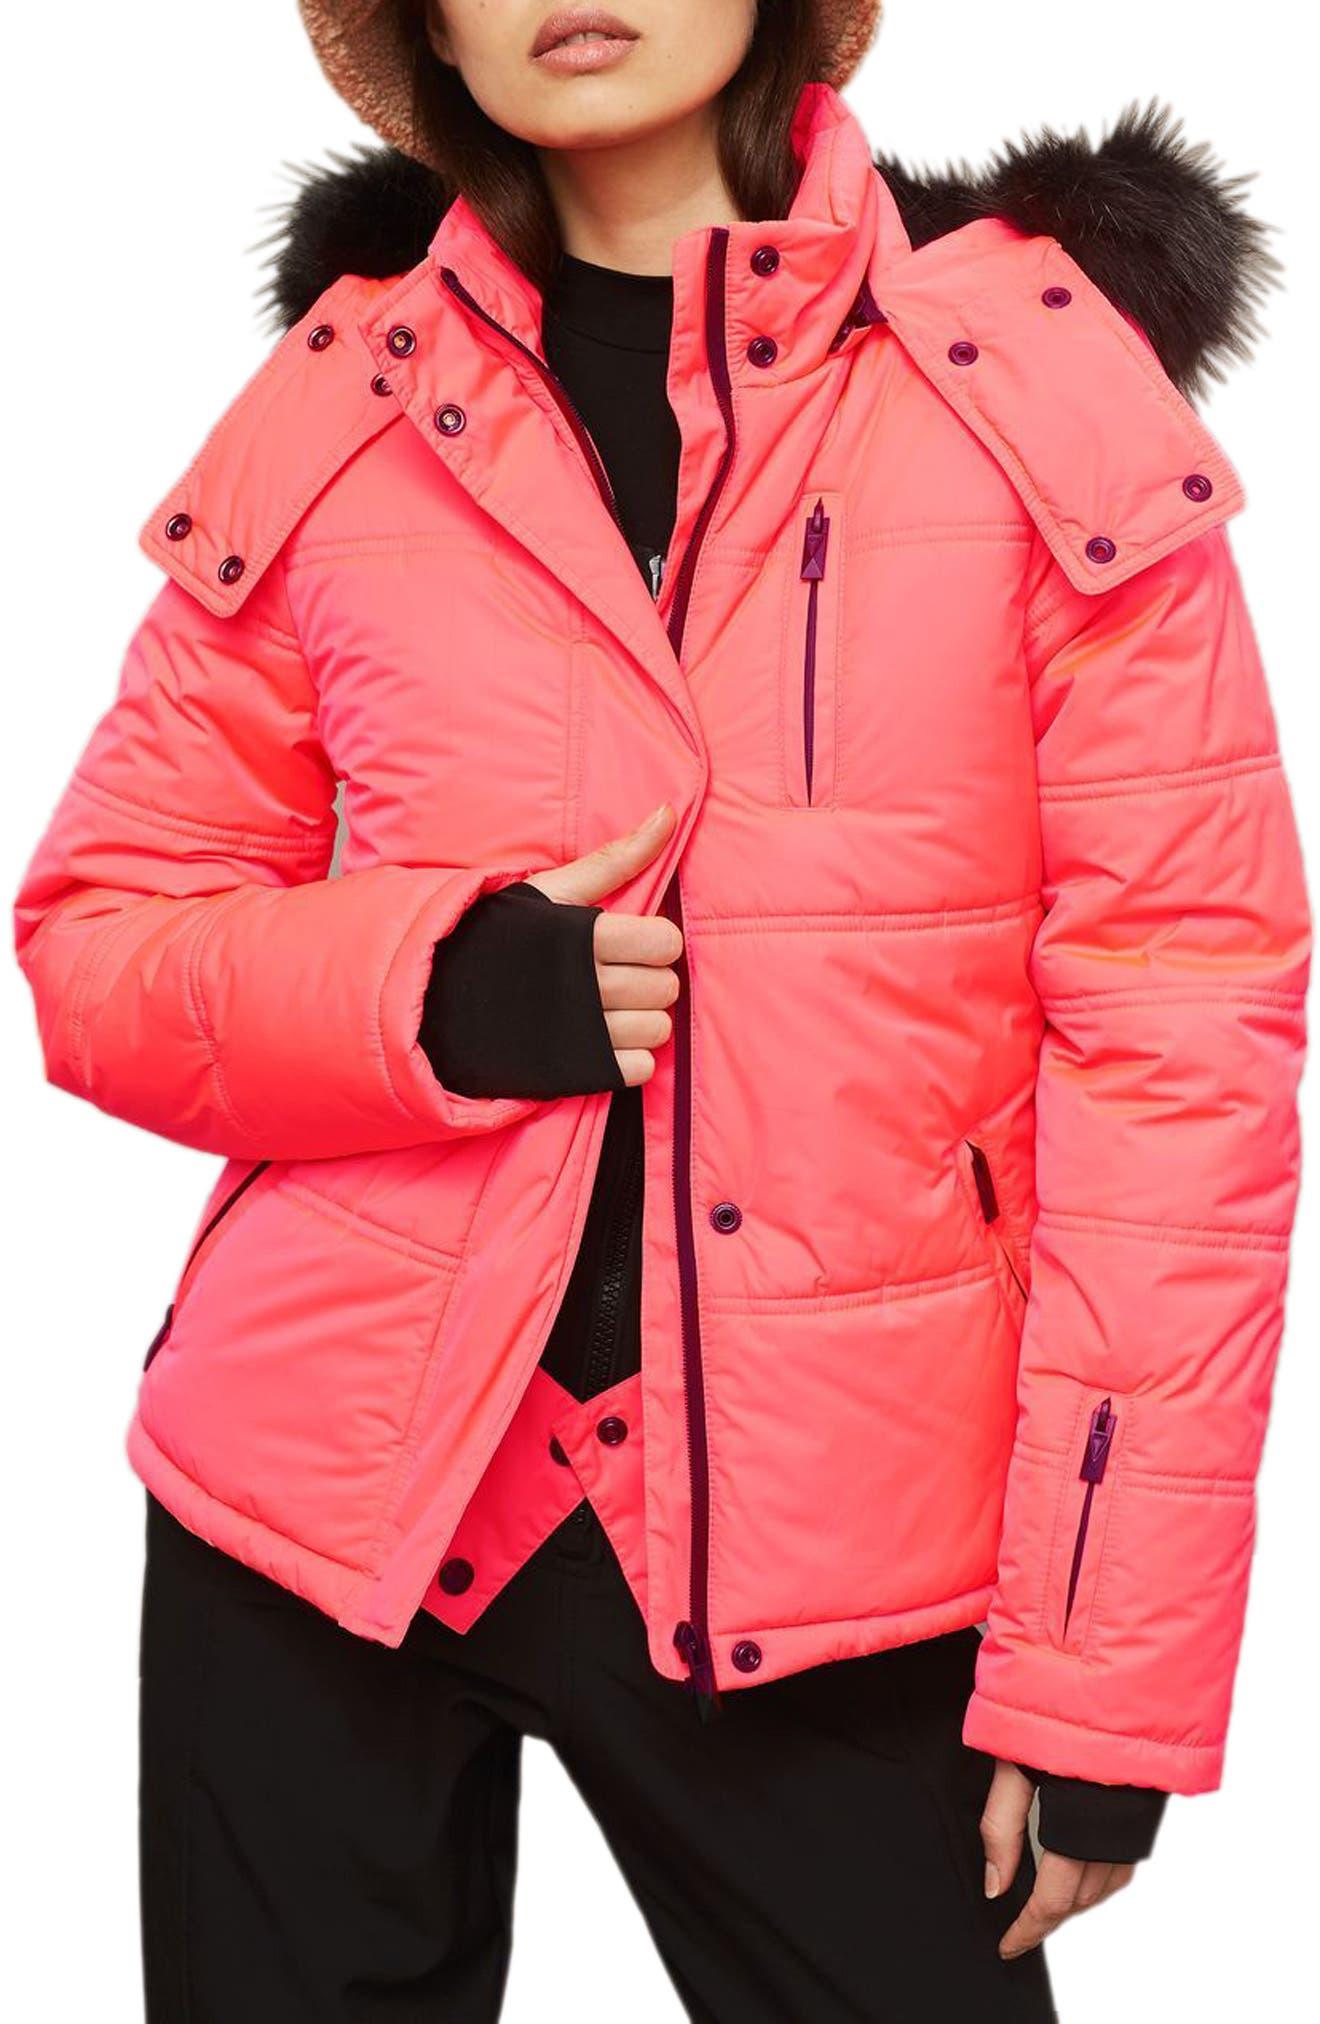 SNO Rio Faux Fur Hood Neon Puffer Jacket,                             Main thumbnail 1, color,                             650